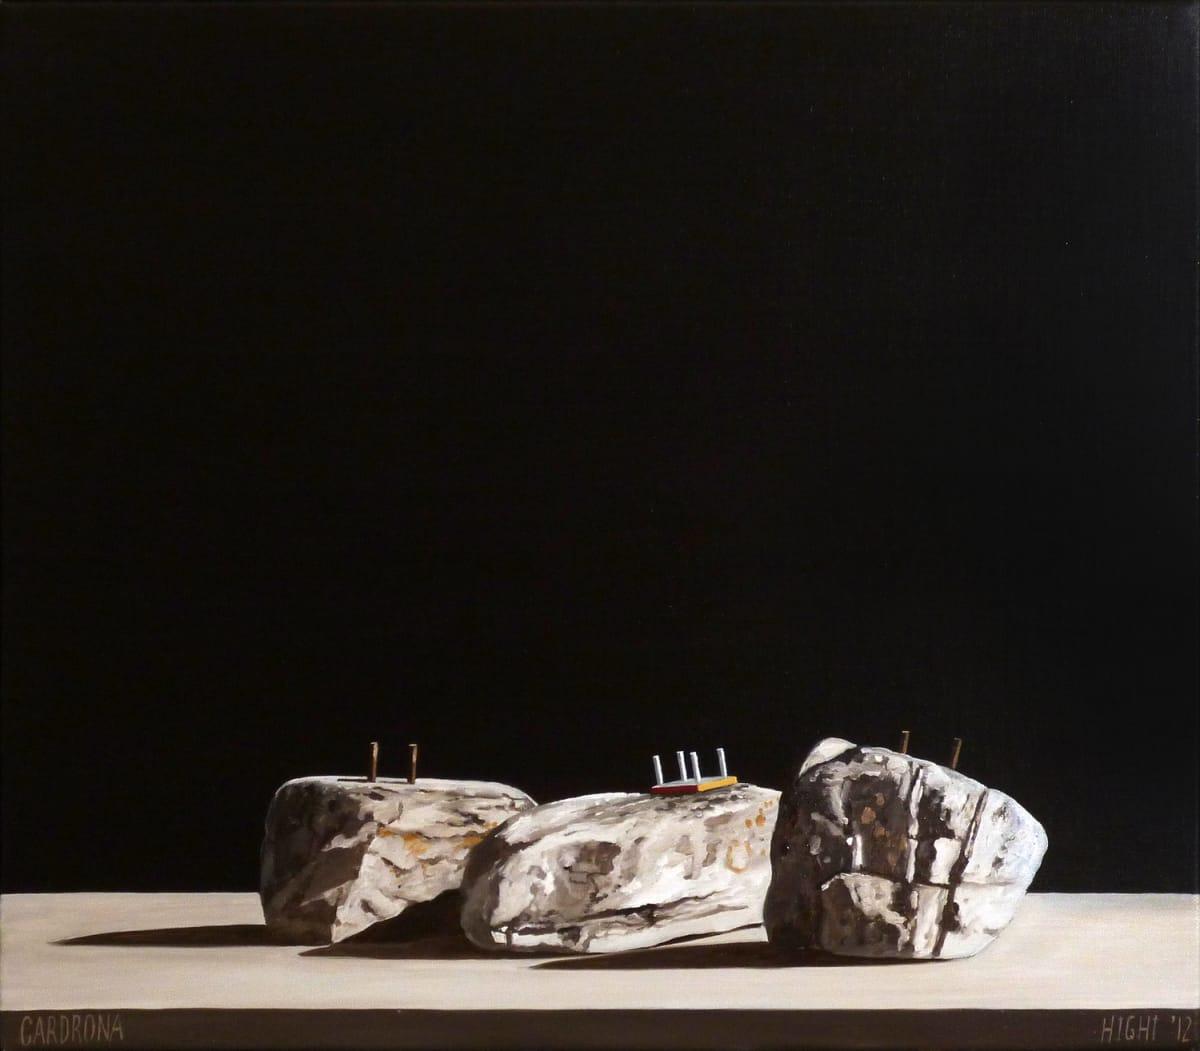 Michael Hight Cardrona, 2012 Oil on linen 14 x 16.1 in 35.5 x 41 cm